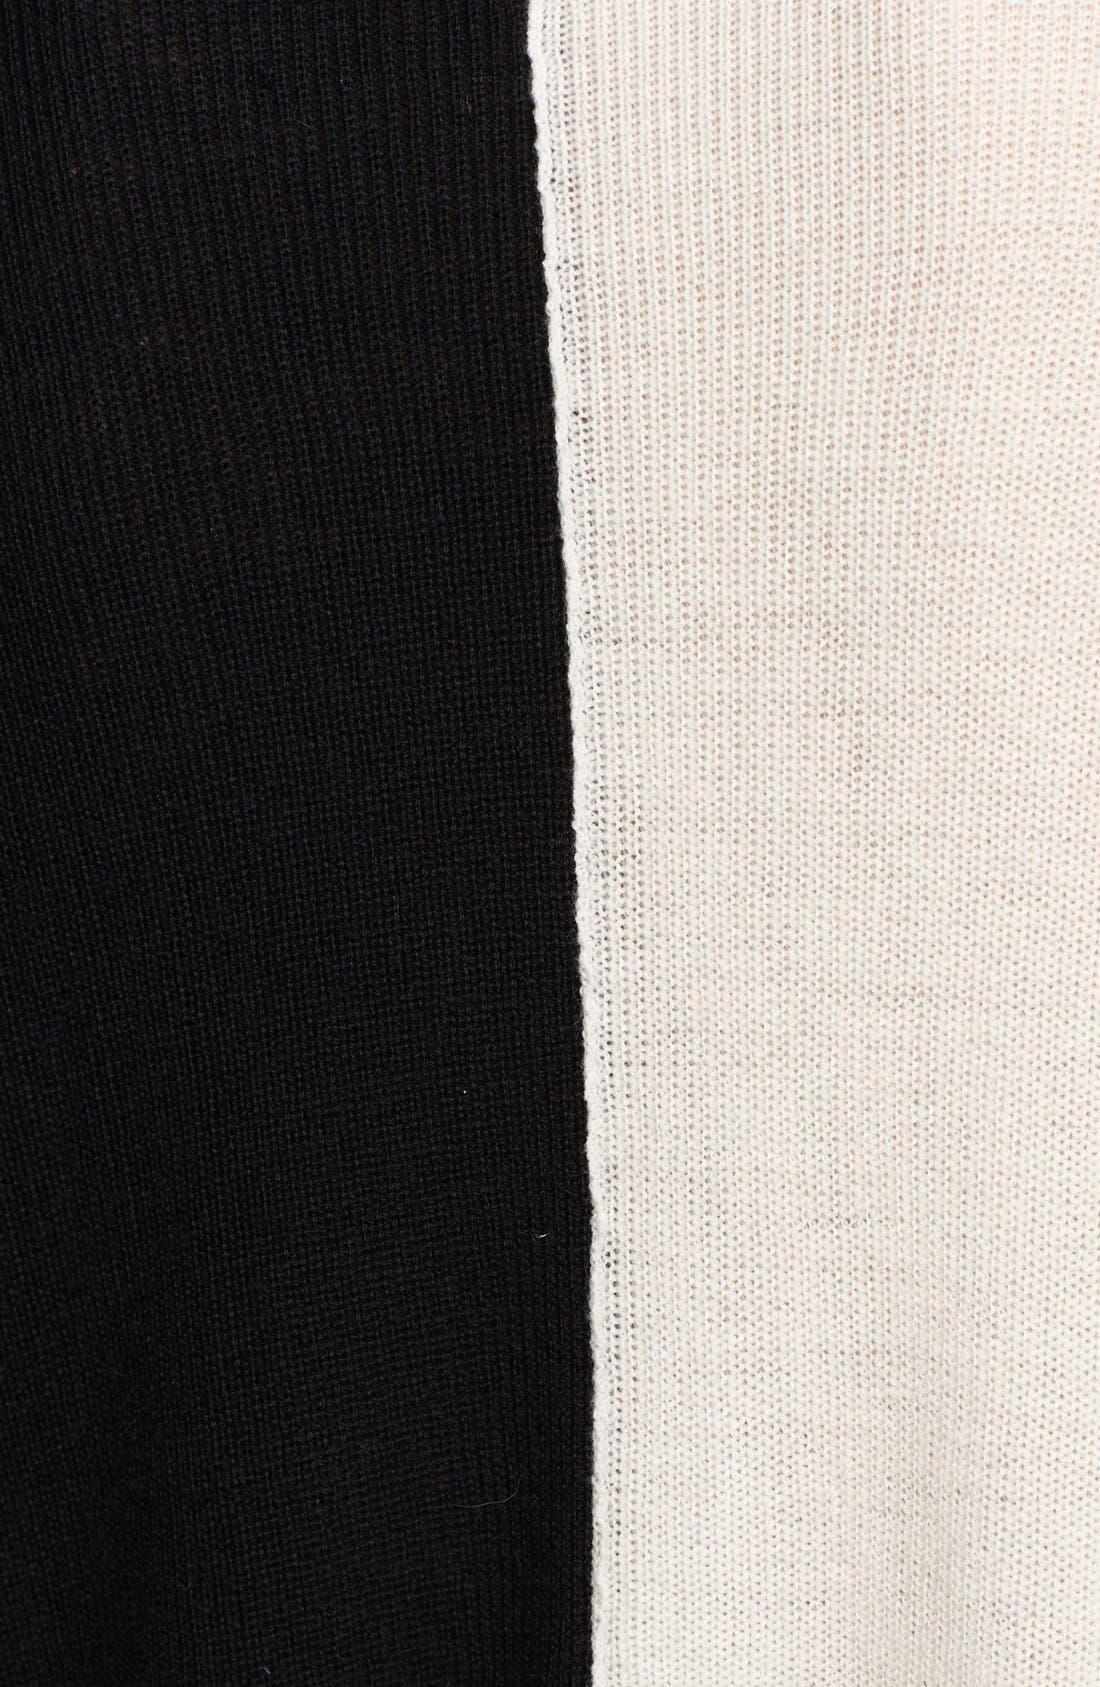 Alternate Image 3  - Yigal Azrouël Colorblock Sweater